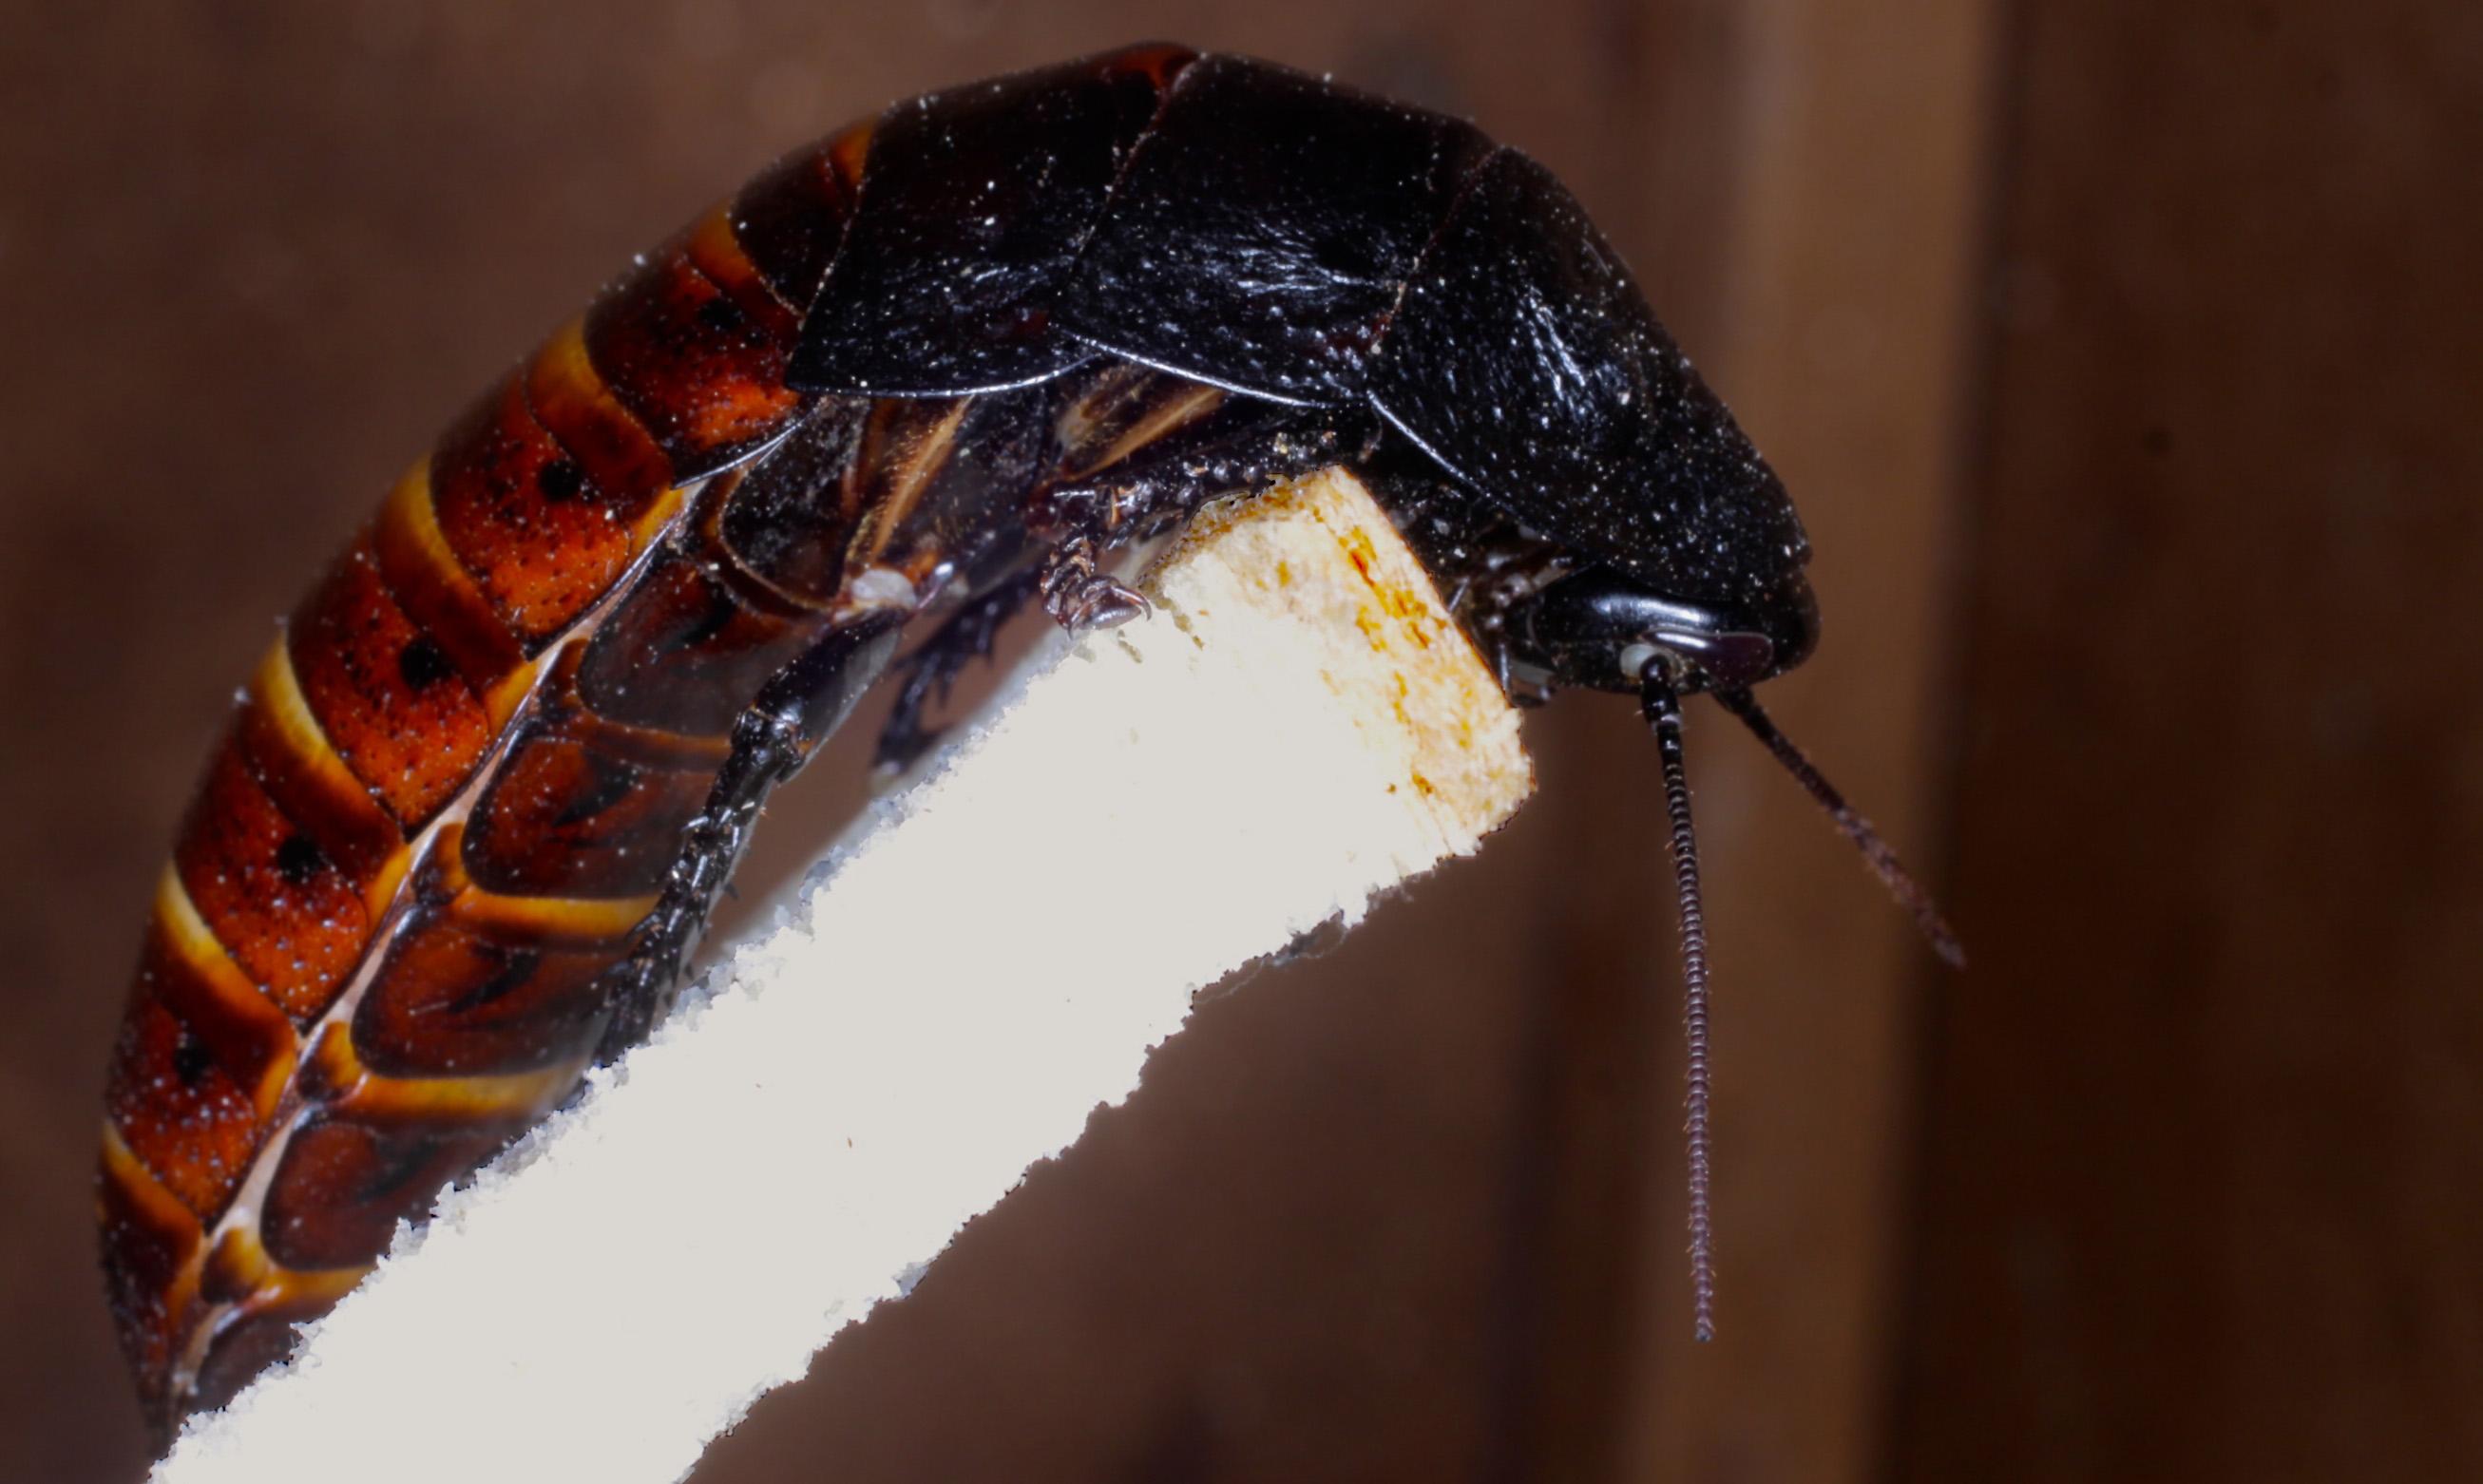 gromphadorhina .portentosa.jpg